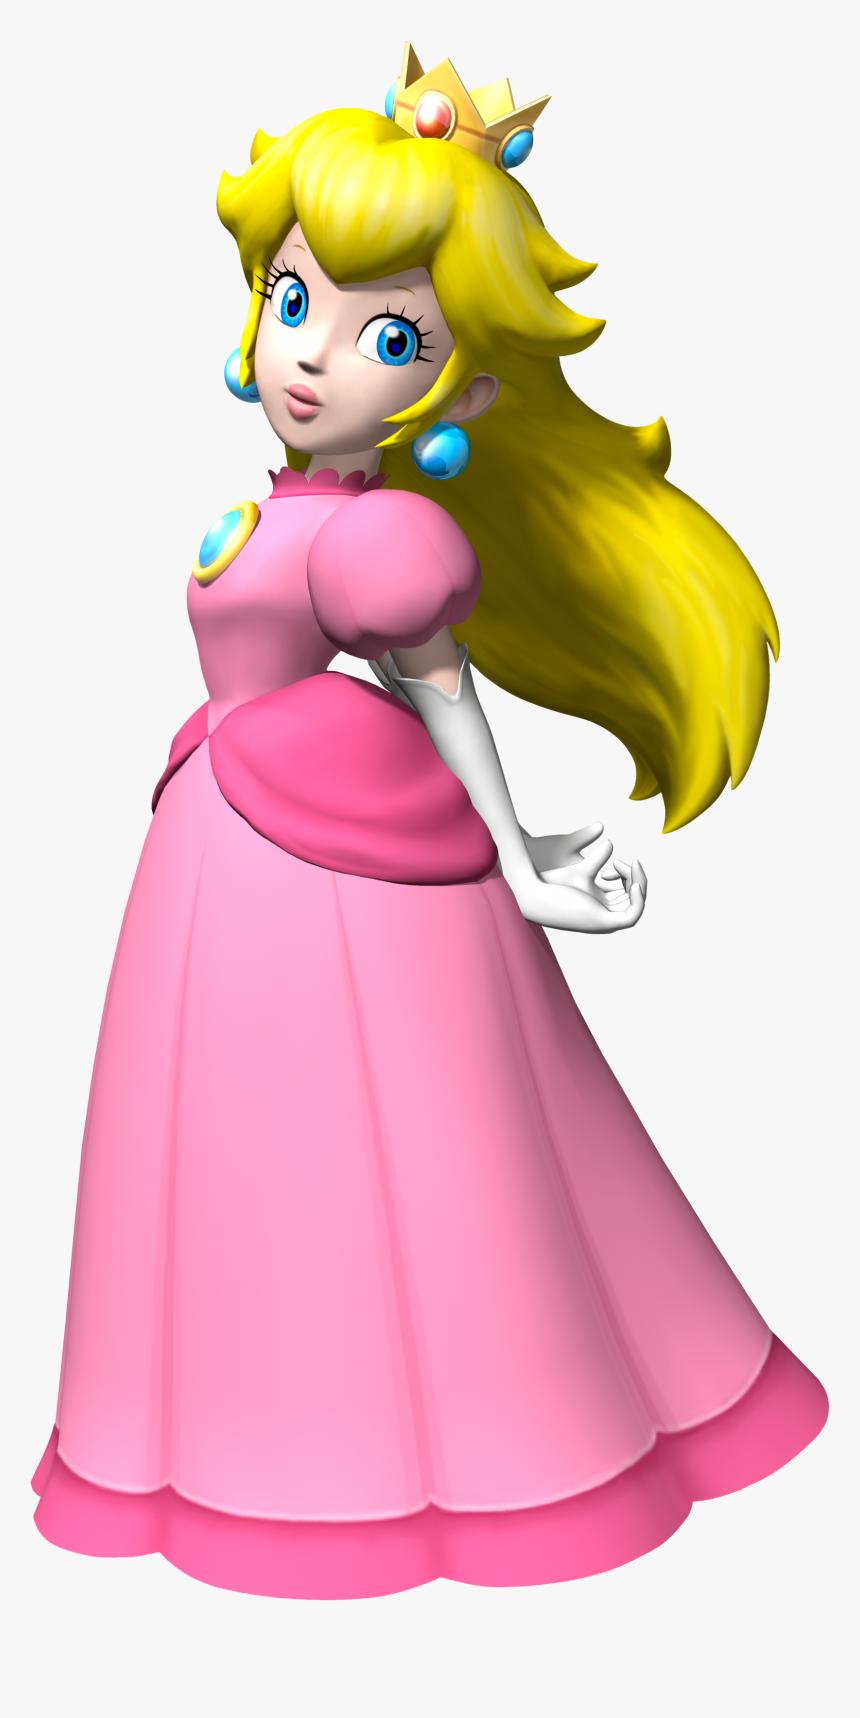 Princess Peach Png Mario Kart Wii Peach Transparent Png